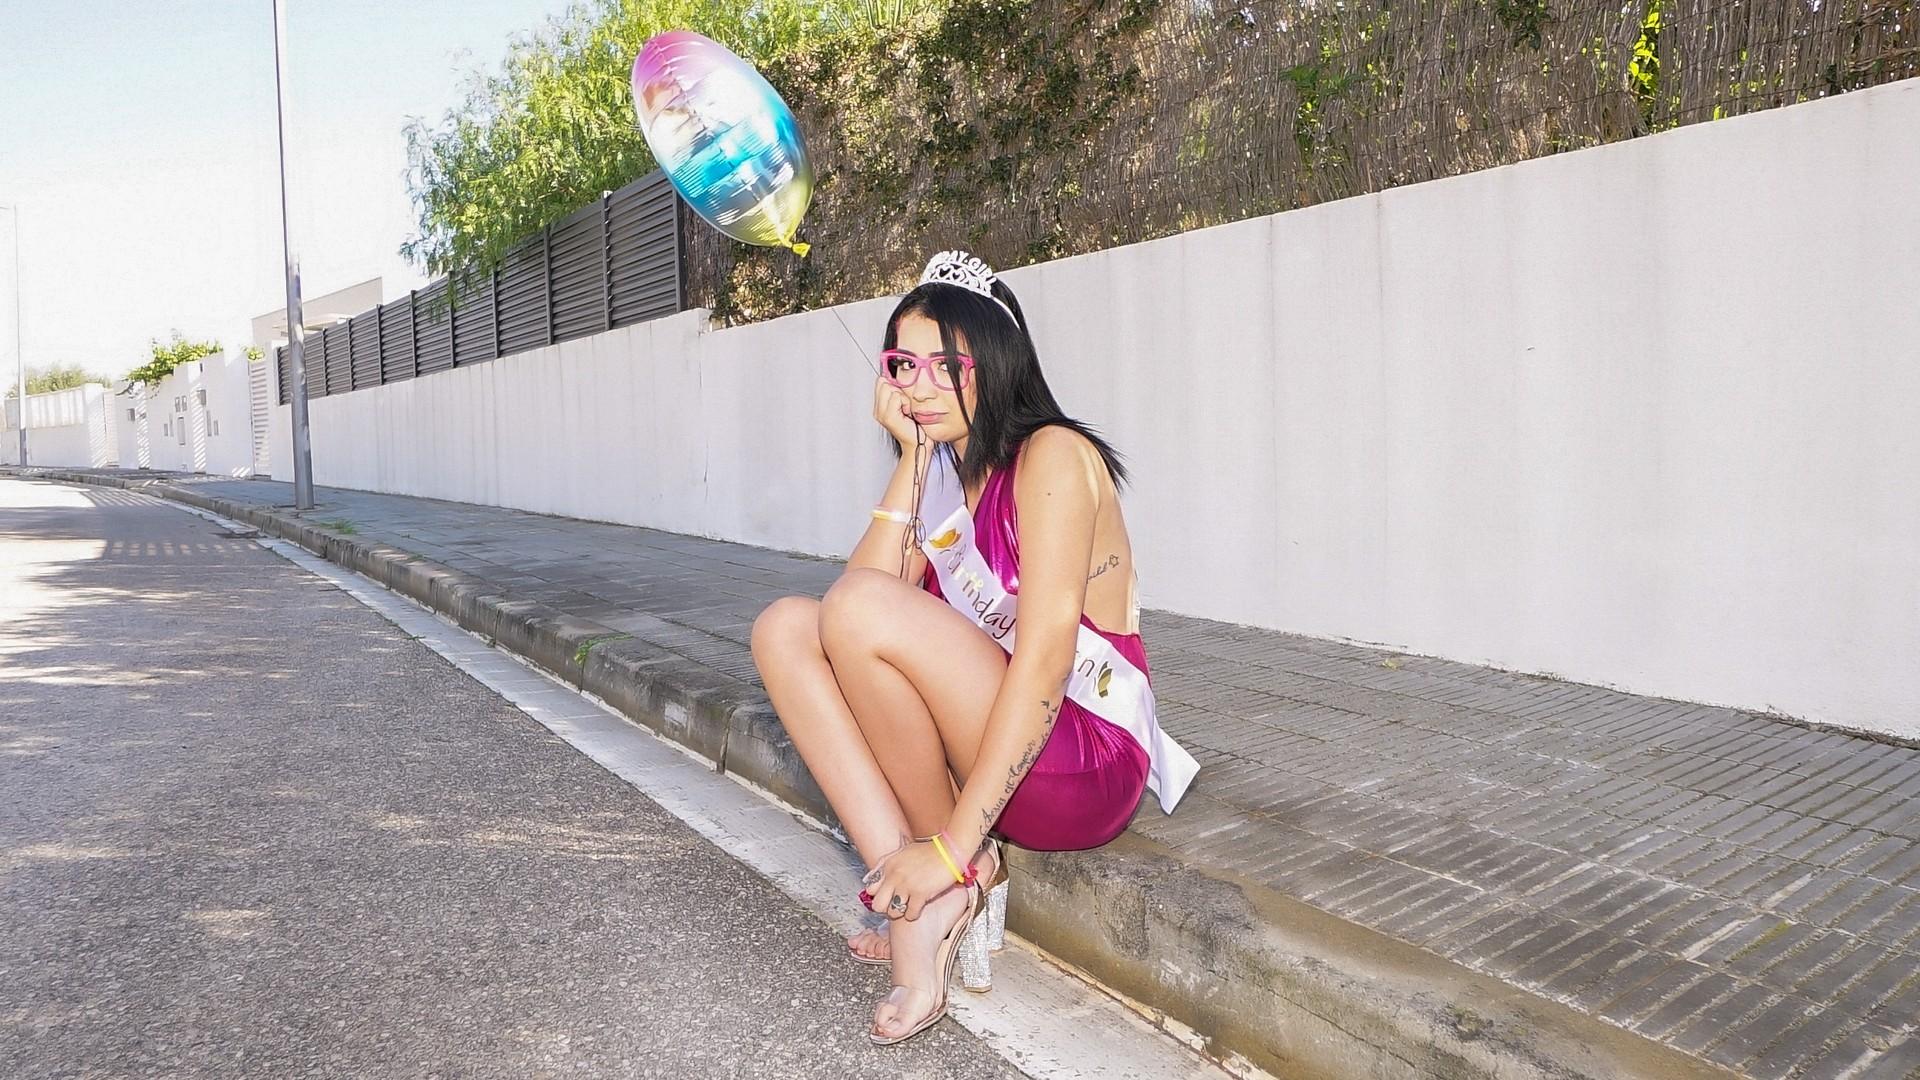 Brazen Birthday Girl - Public Pickups